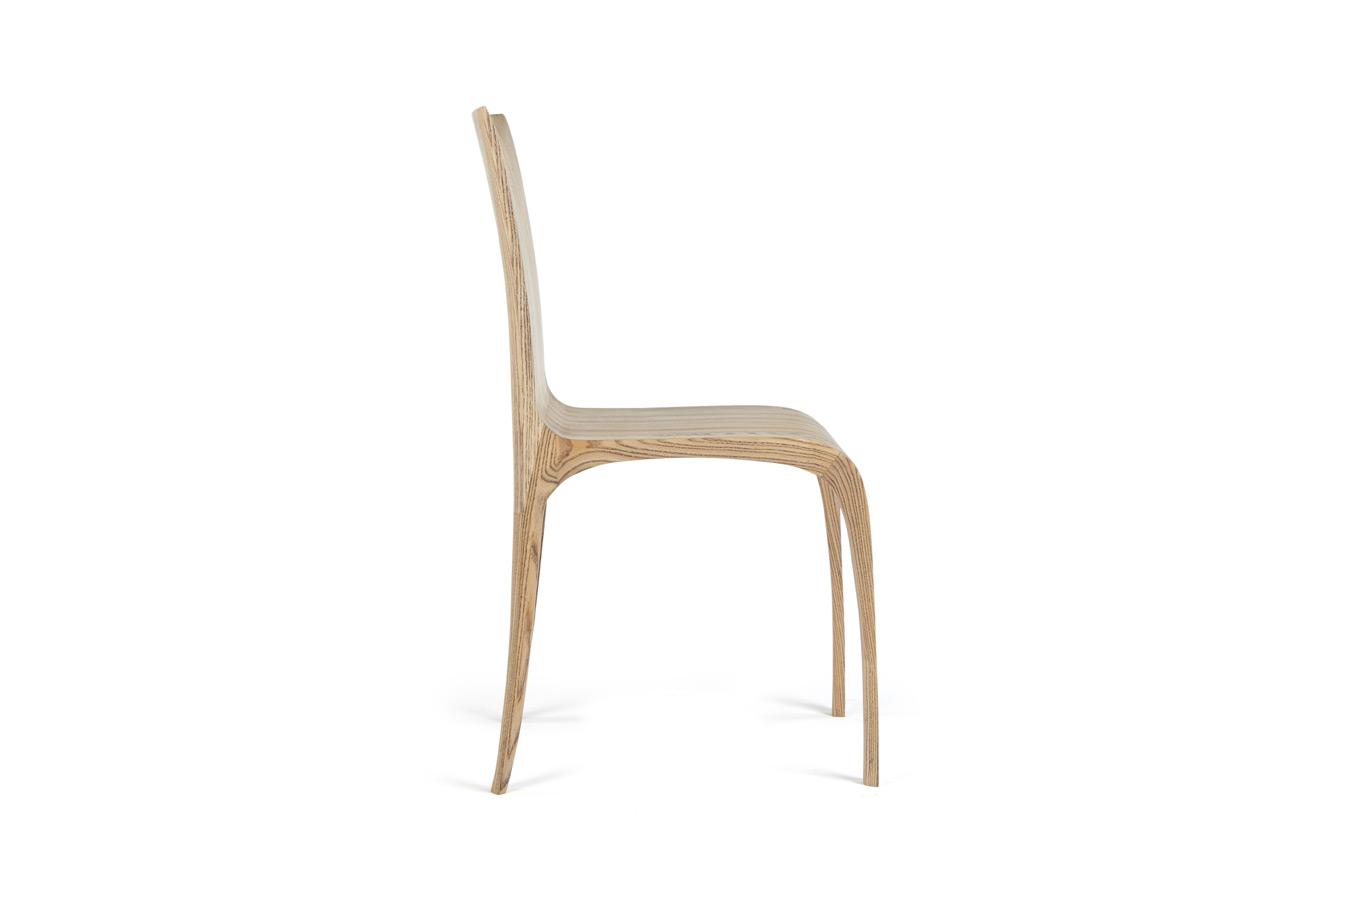 7_Rippled-Ash-Dining-Chair_3.jpg